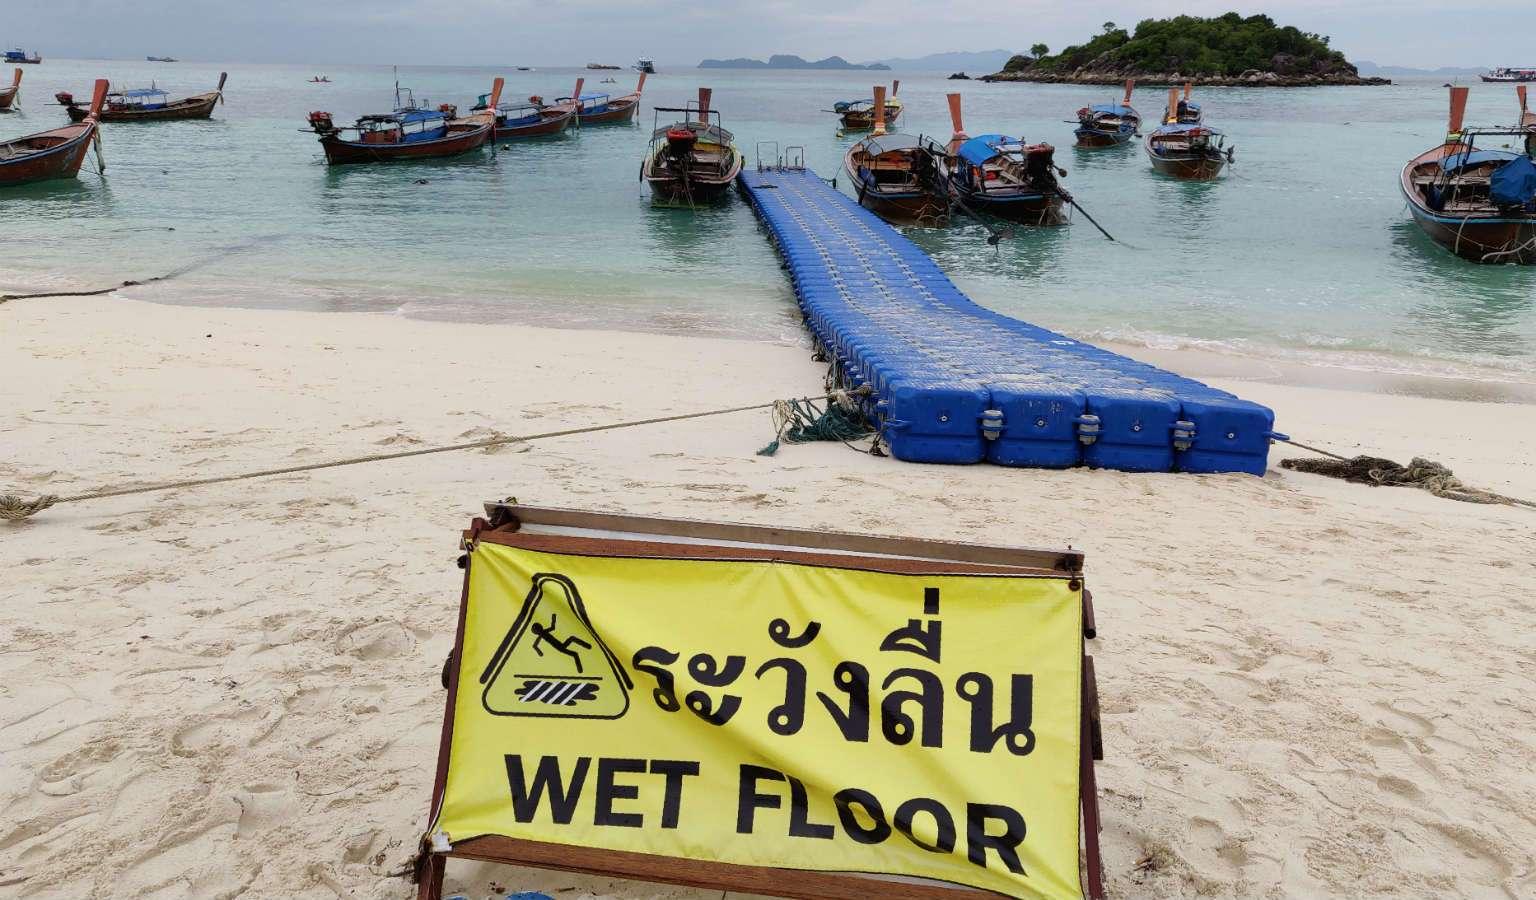 Wet floor sign for the floating pier on the Sunrise Beach